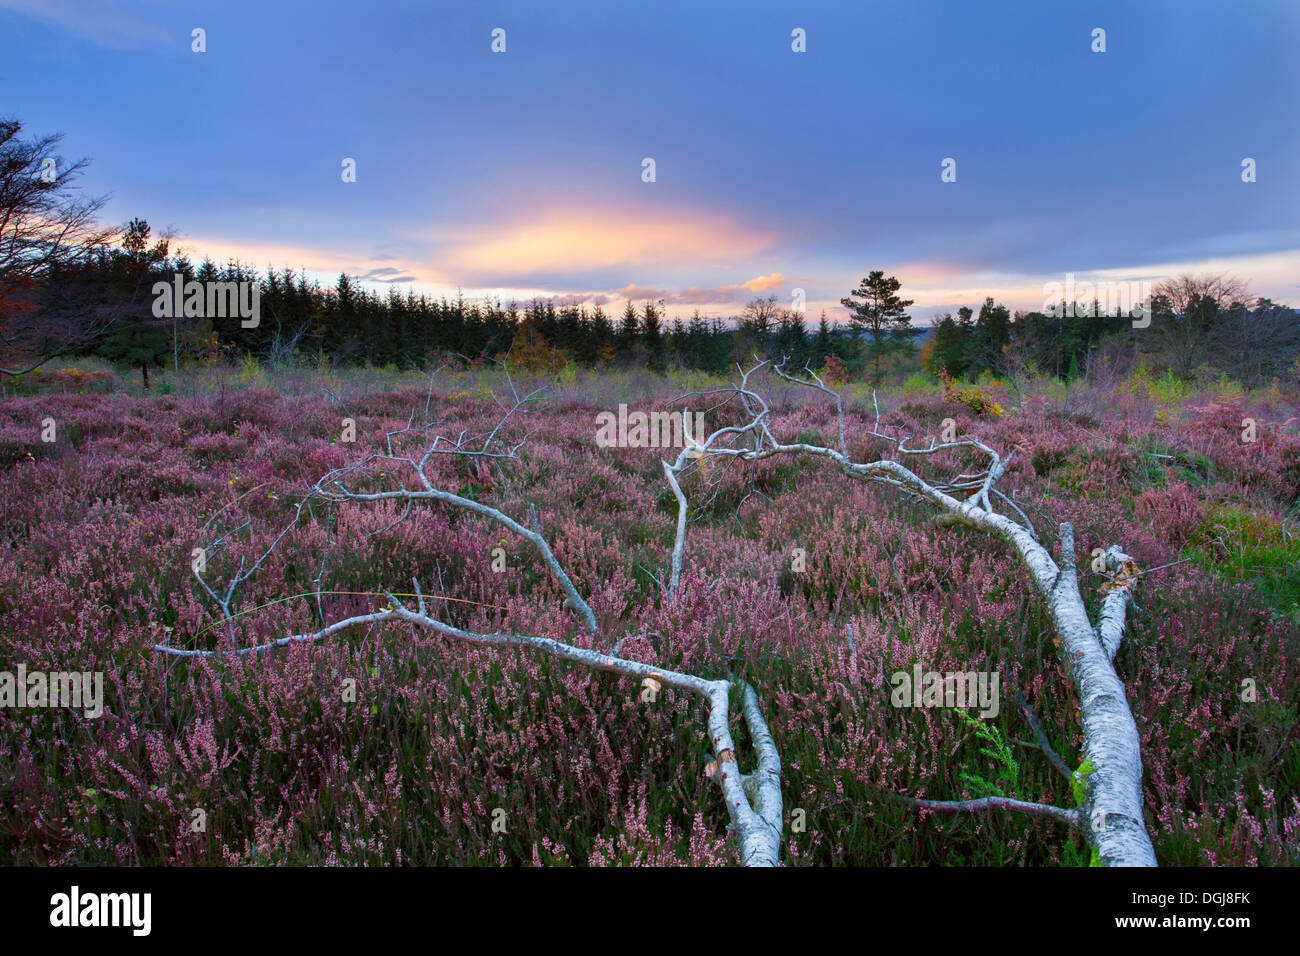 Fallen Silver Birch tree on restored heathland. - Stock Image